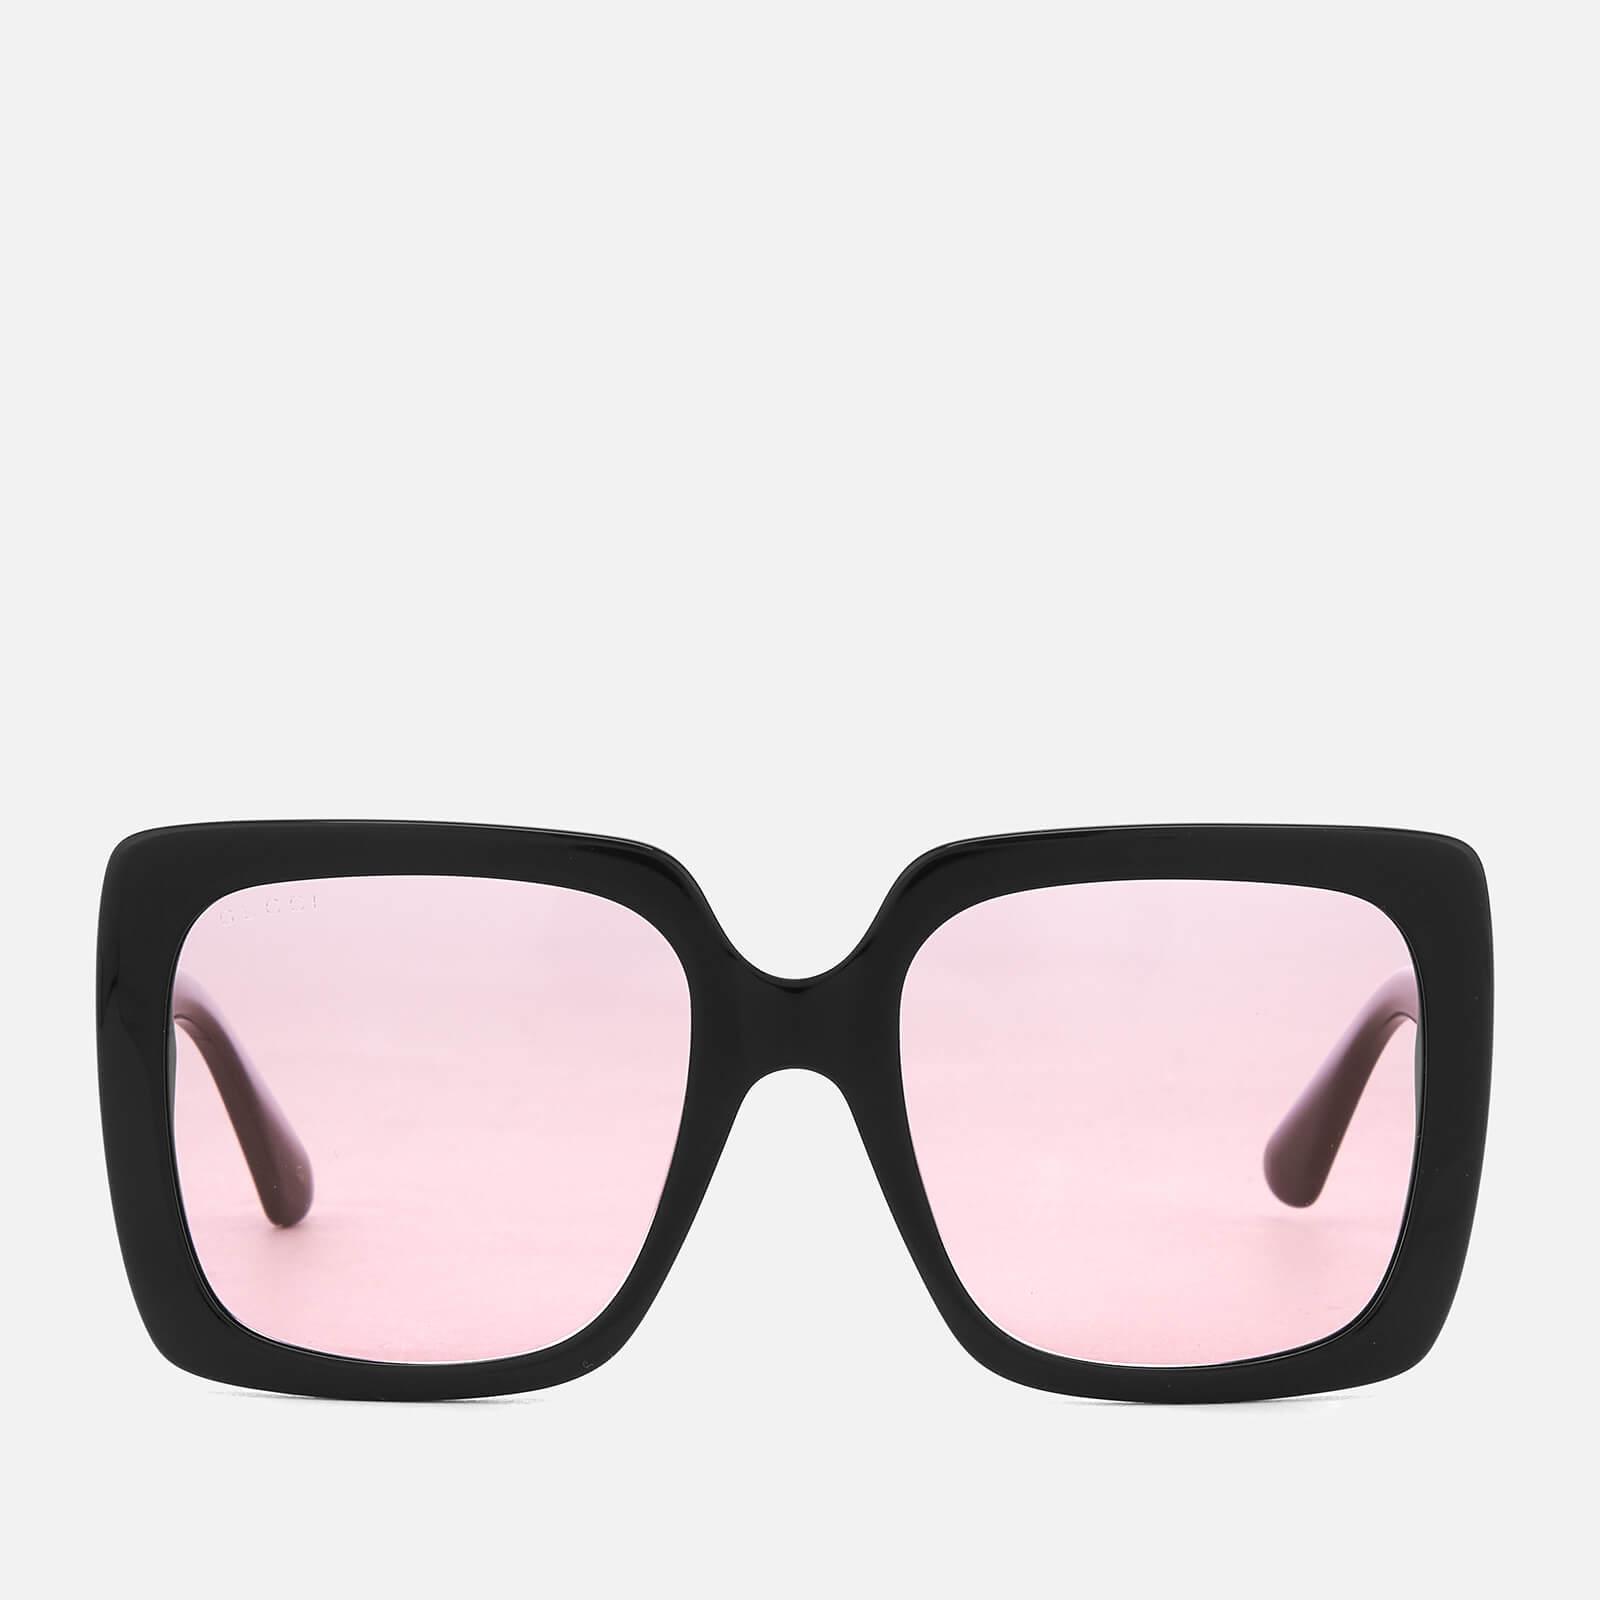 132c0d589da Gucci Women s Square Frame Acetate Sunglasses - Black Pink - Free UK  Delivery over £50